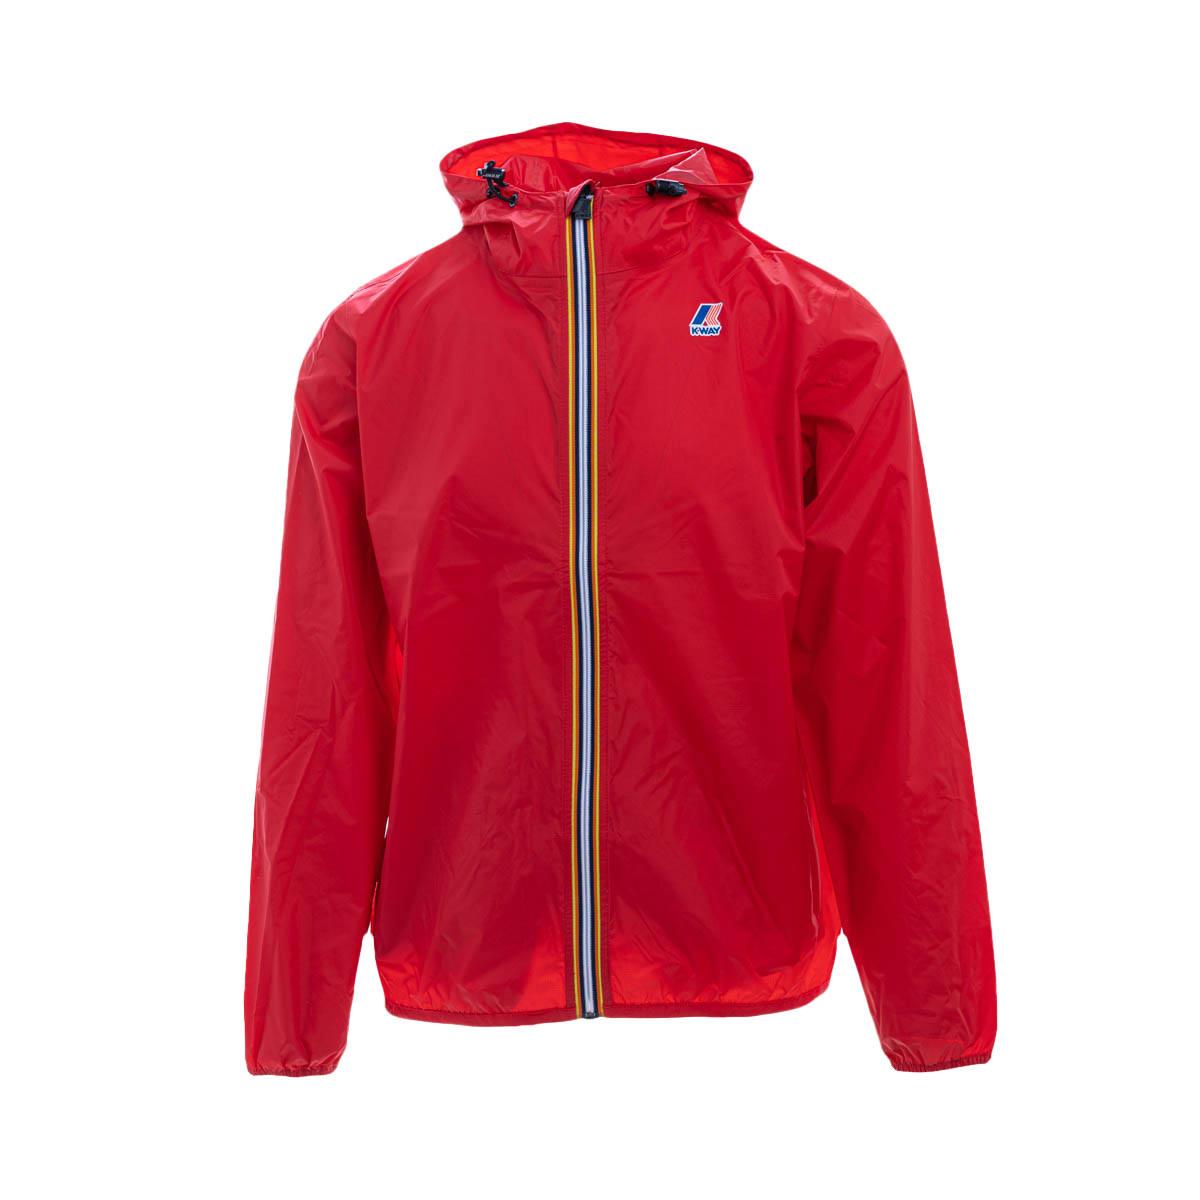 K-way K-way Technical Fabric Jacket